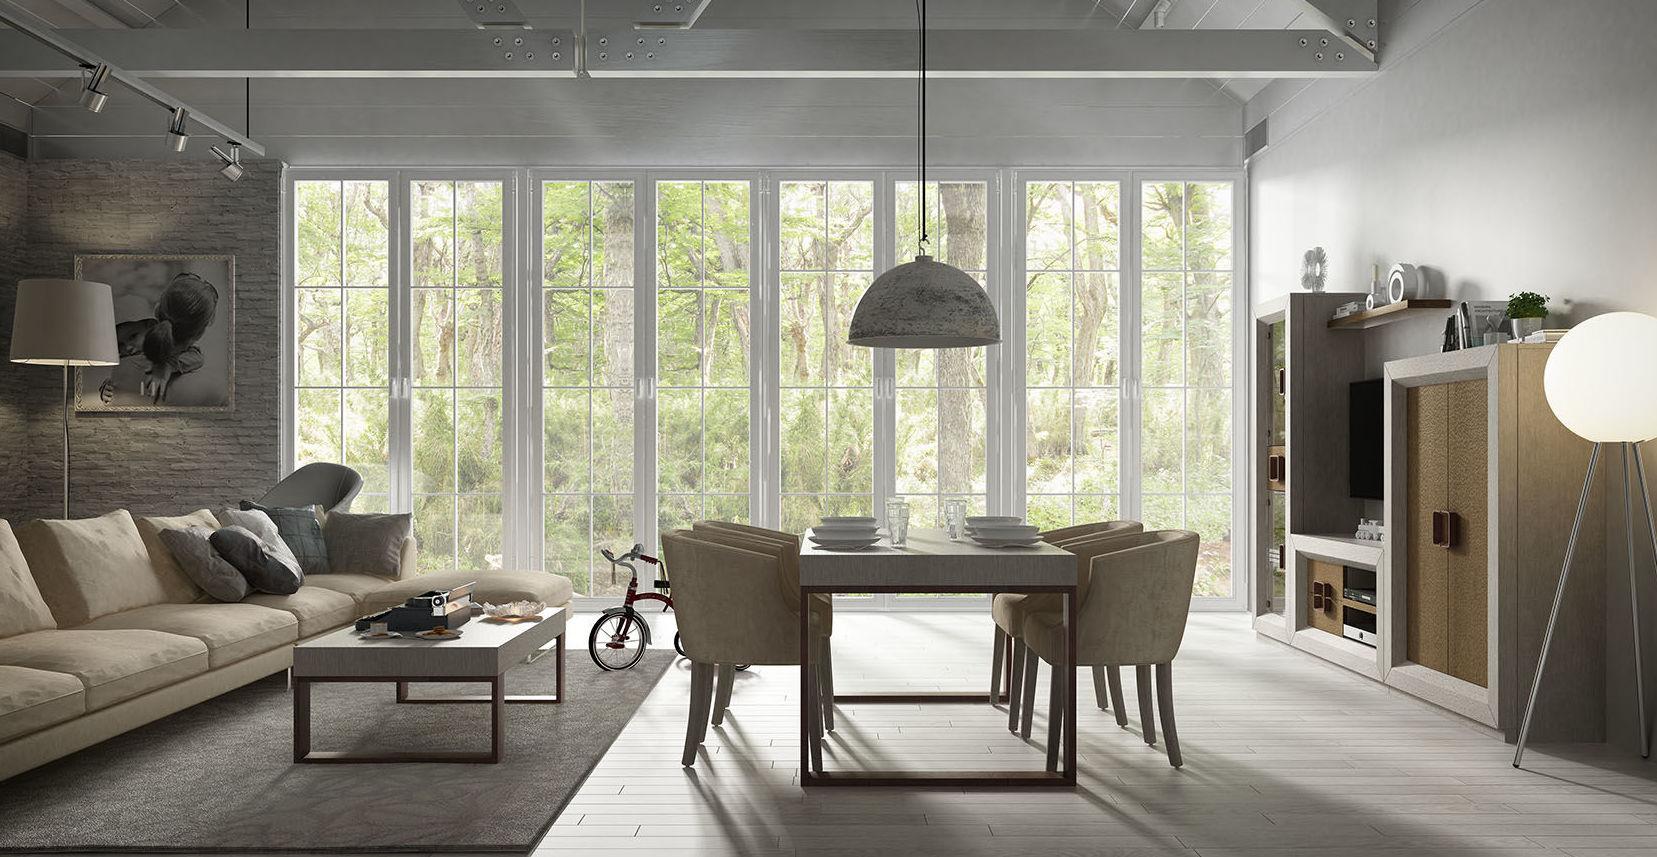 Franco furniture colecci n enzo cat logo de muebles y for Muebles franco